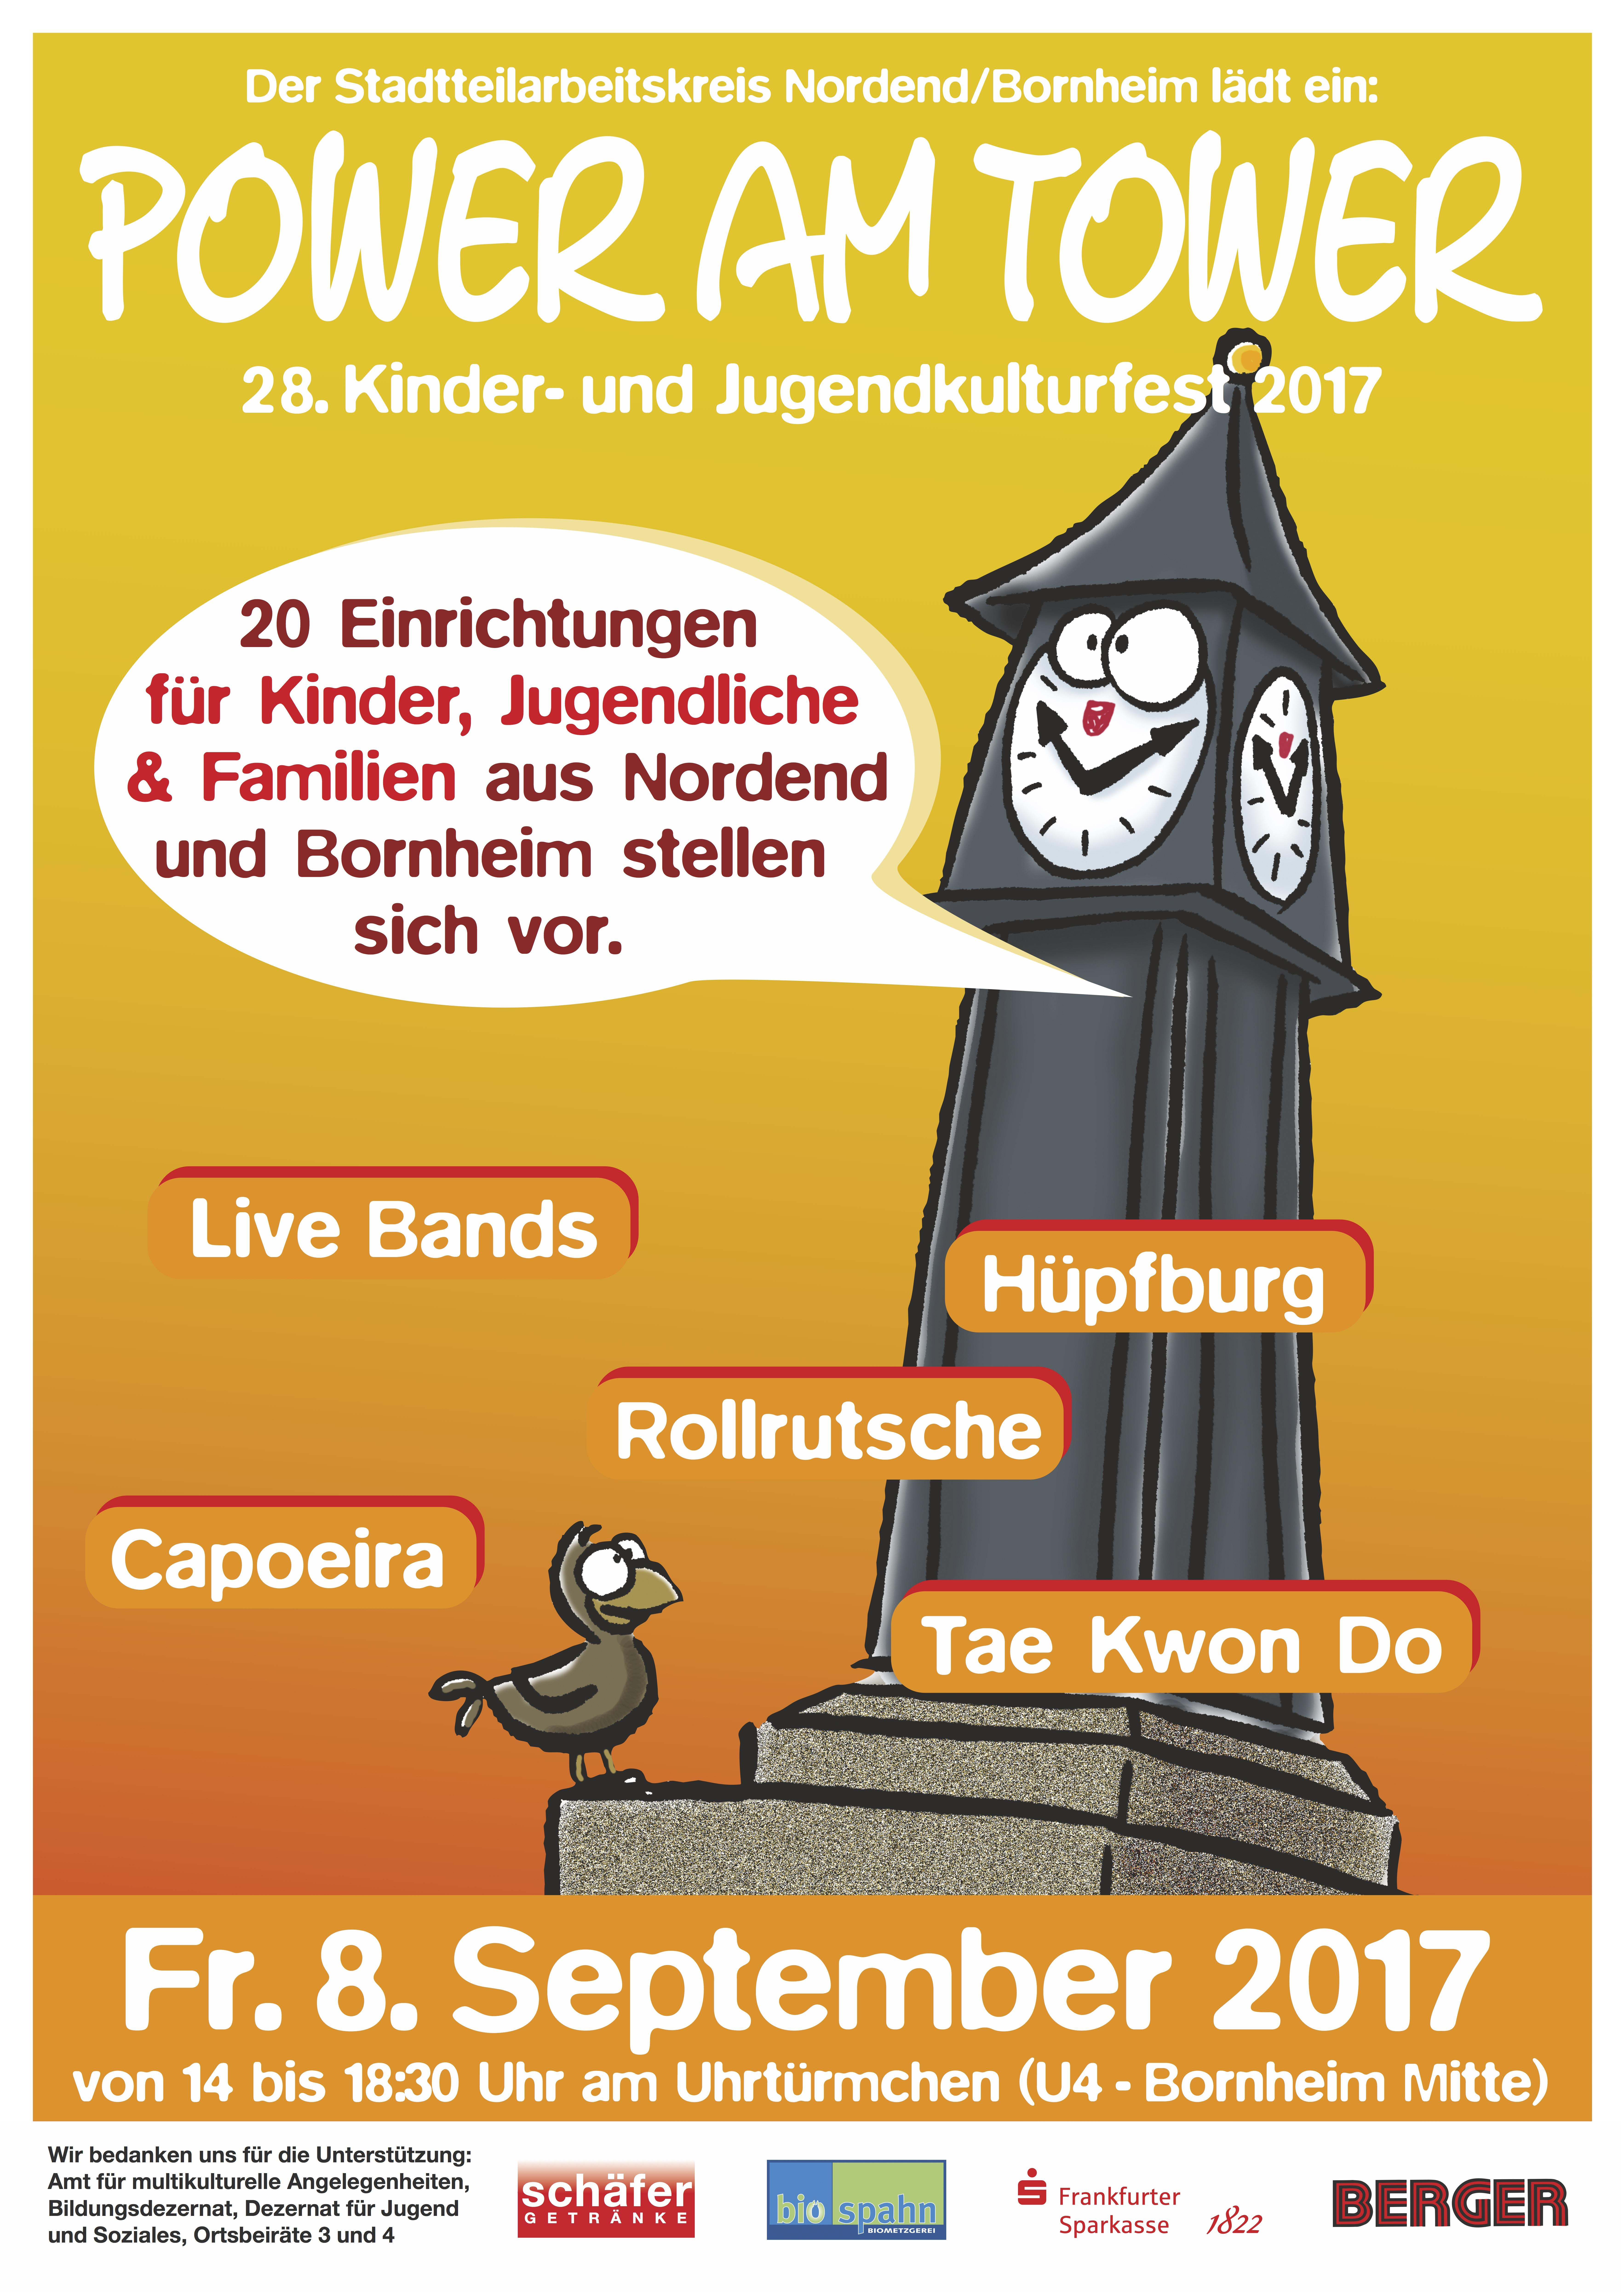 http://www.cvjm-frankfurt.de/blog/power2017_plakat03%20Kopie.jpg